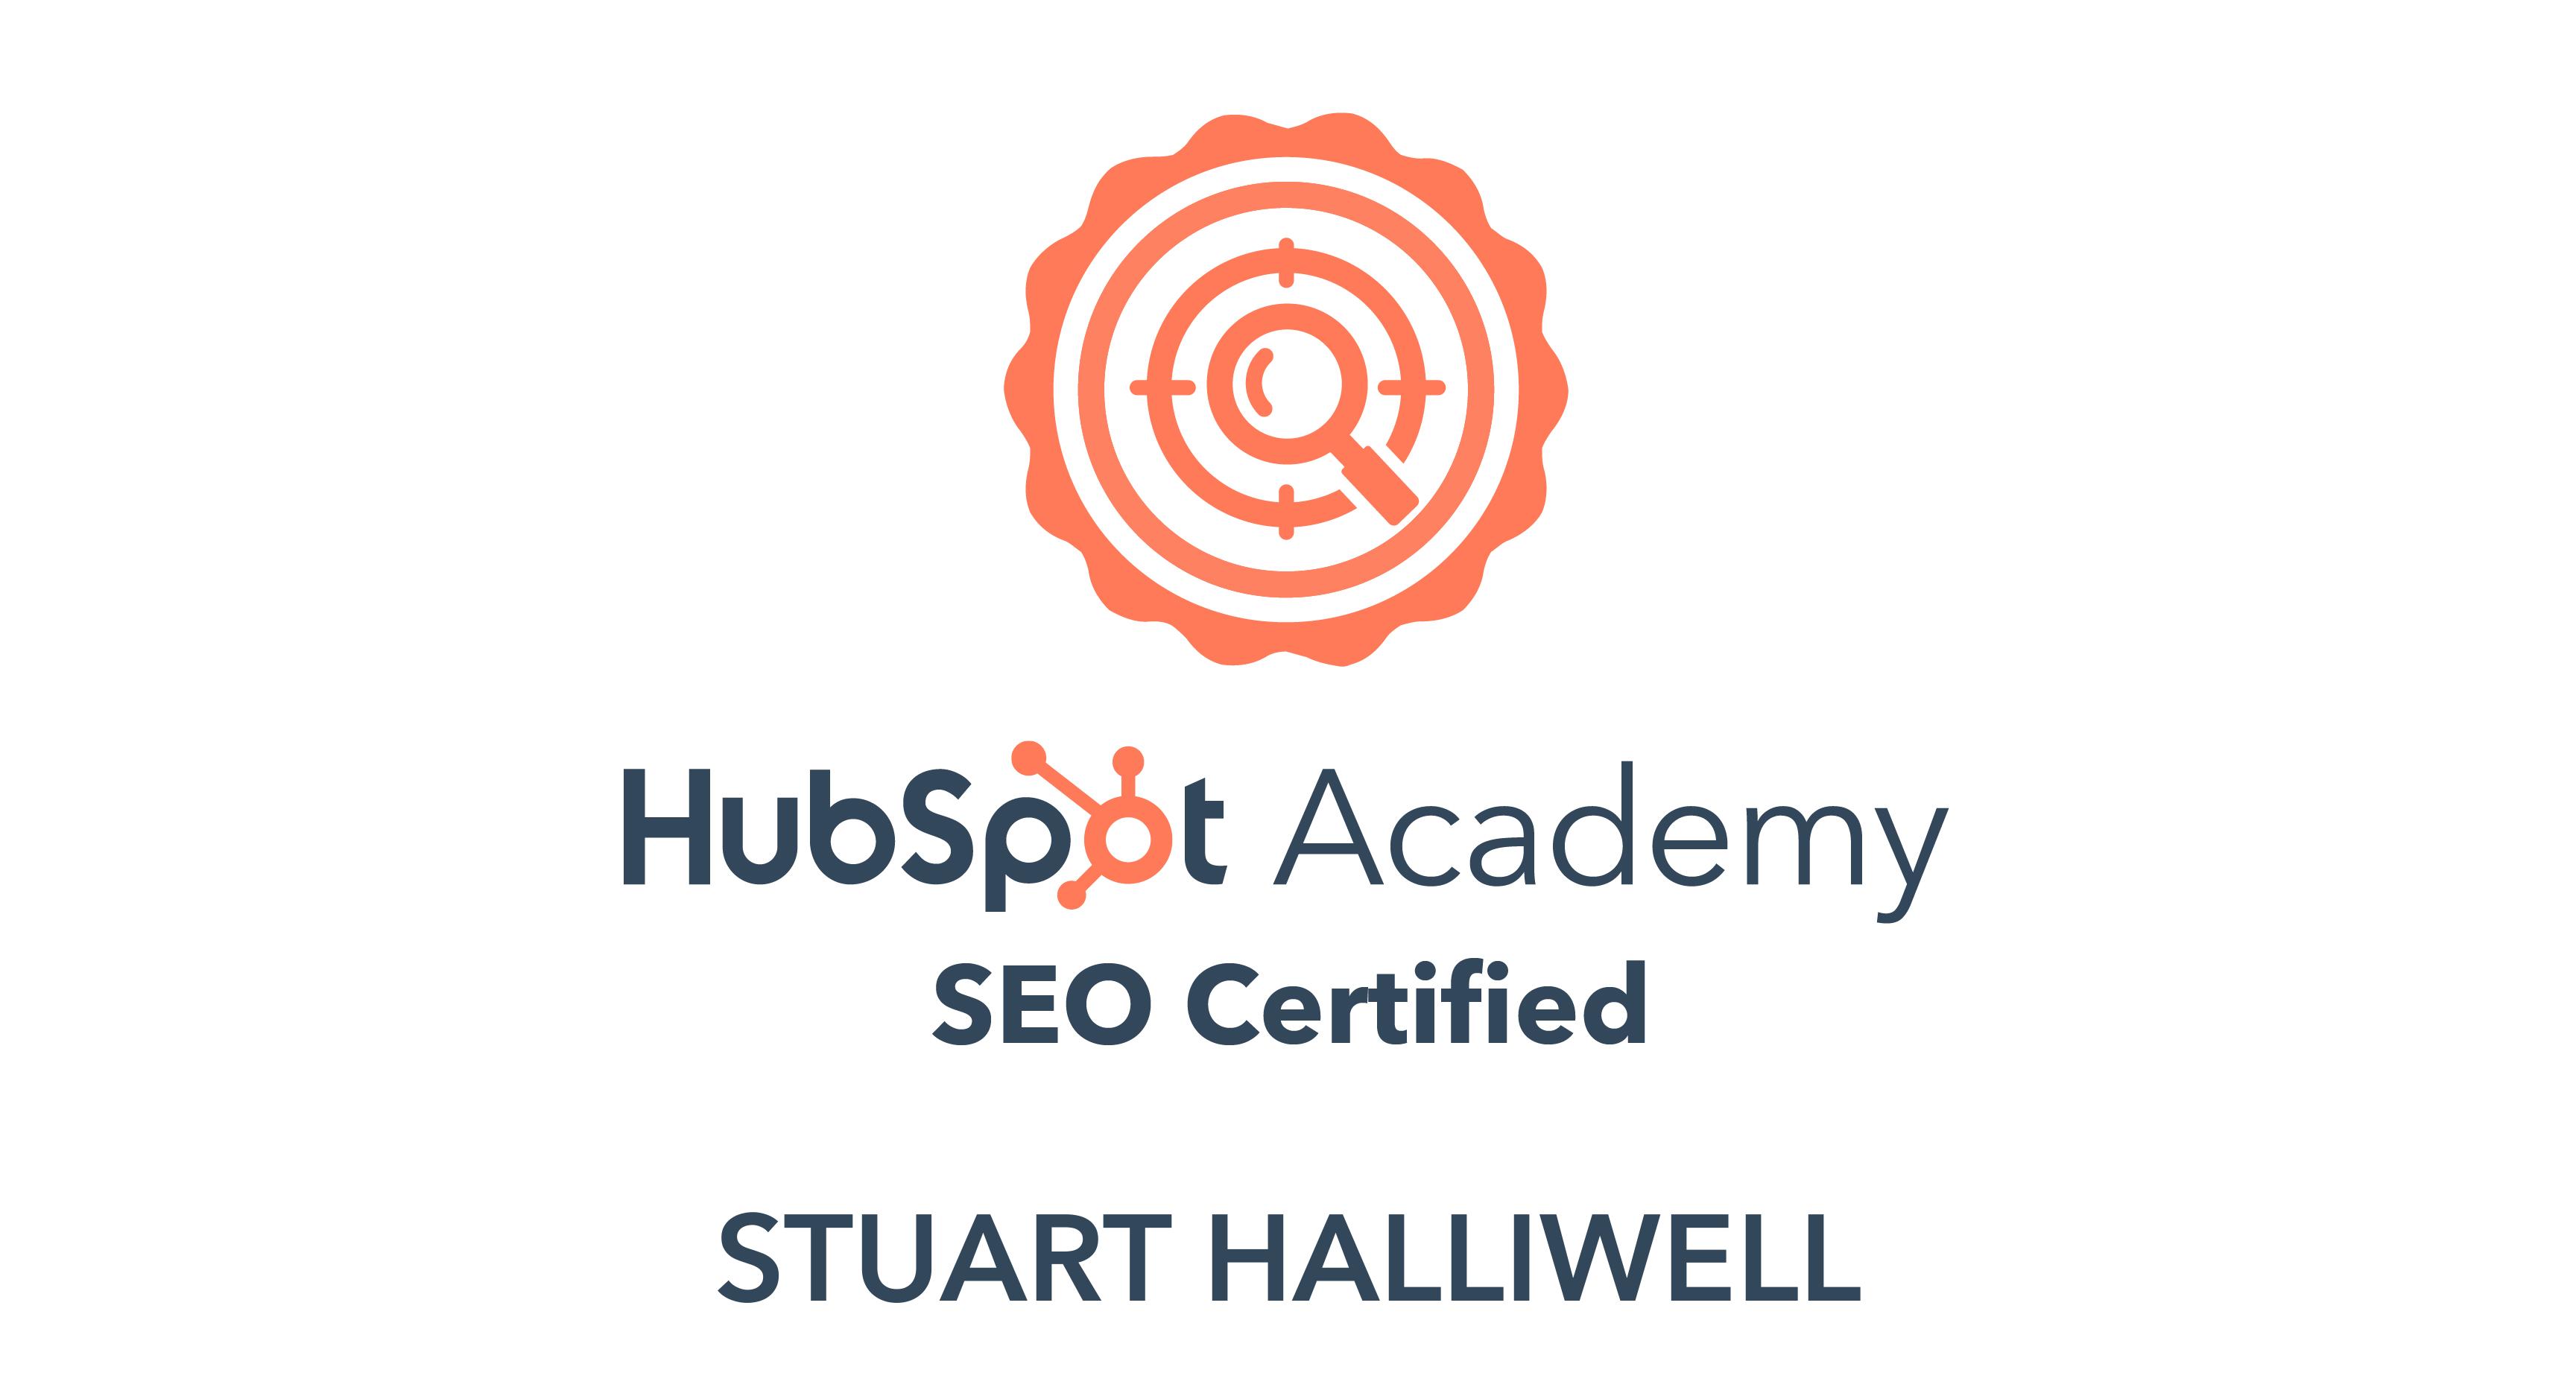 SEO Certified by Hubspot